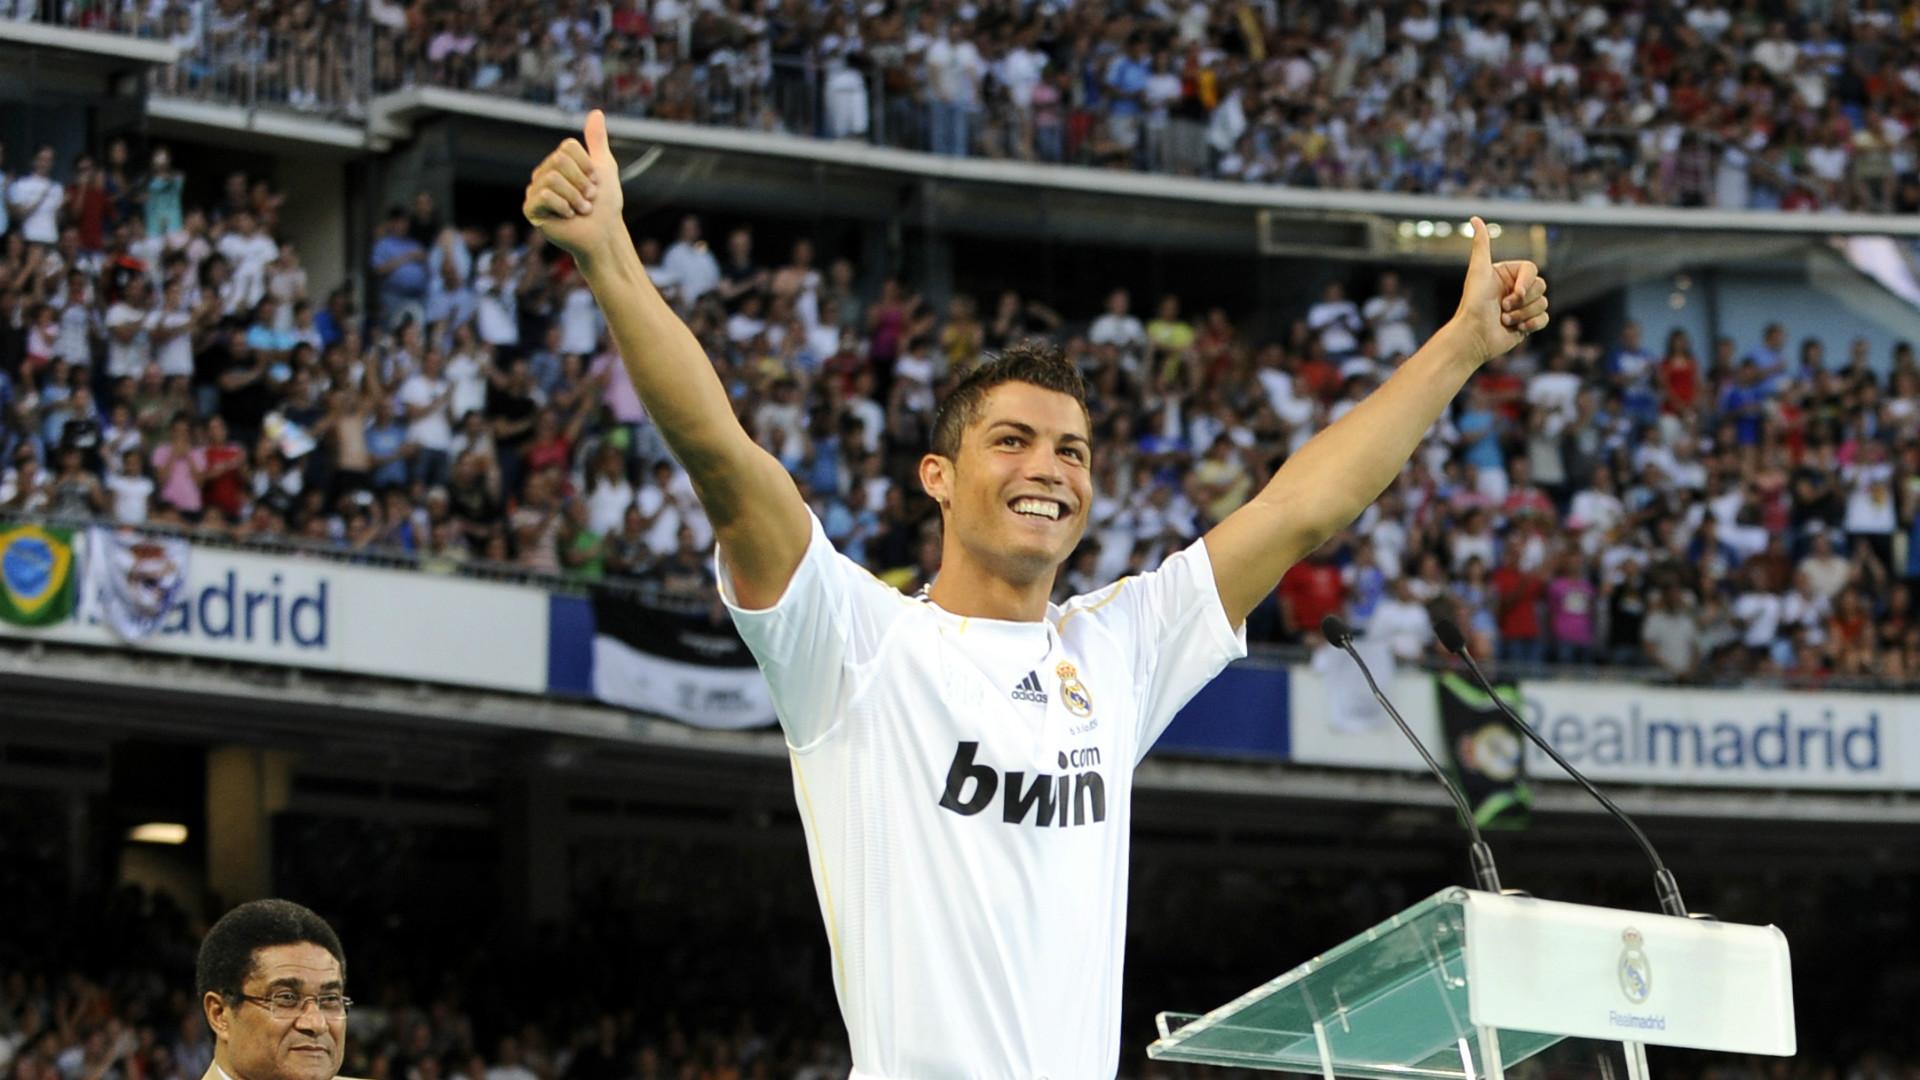 Cristiano Ronaldo Real Madrid 2009